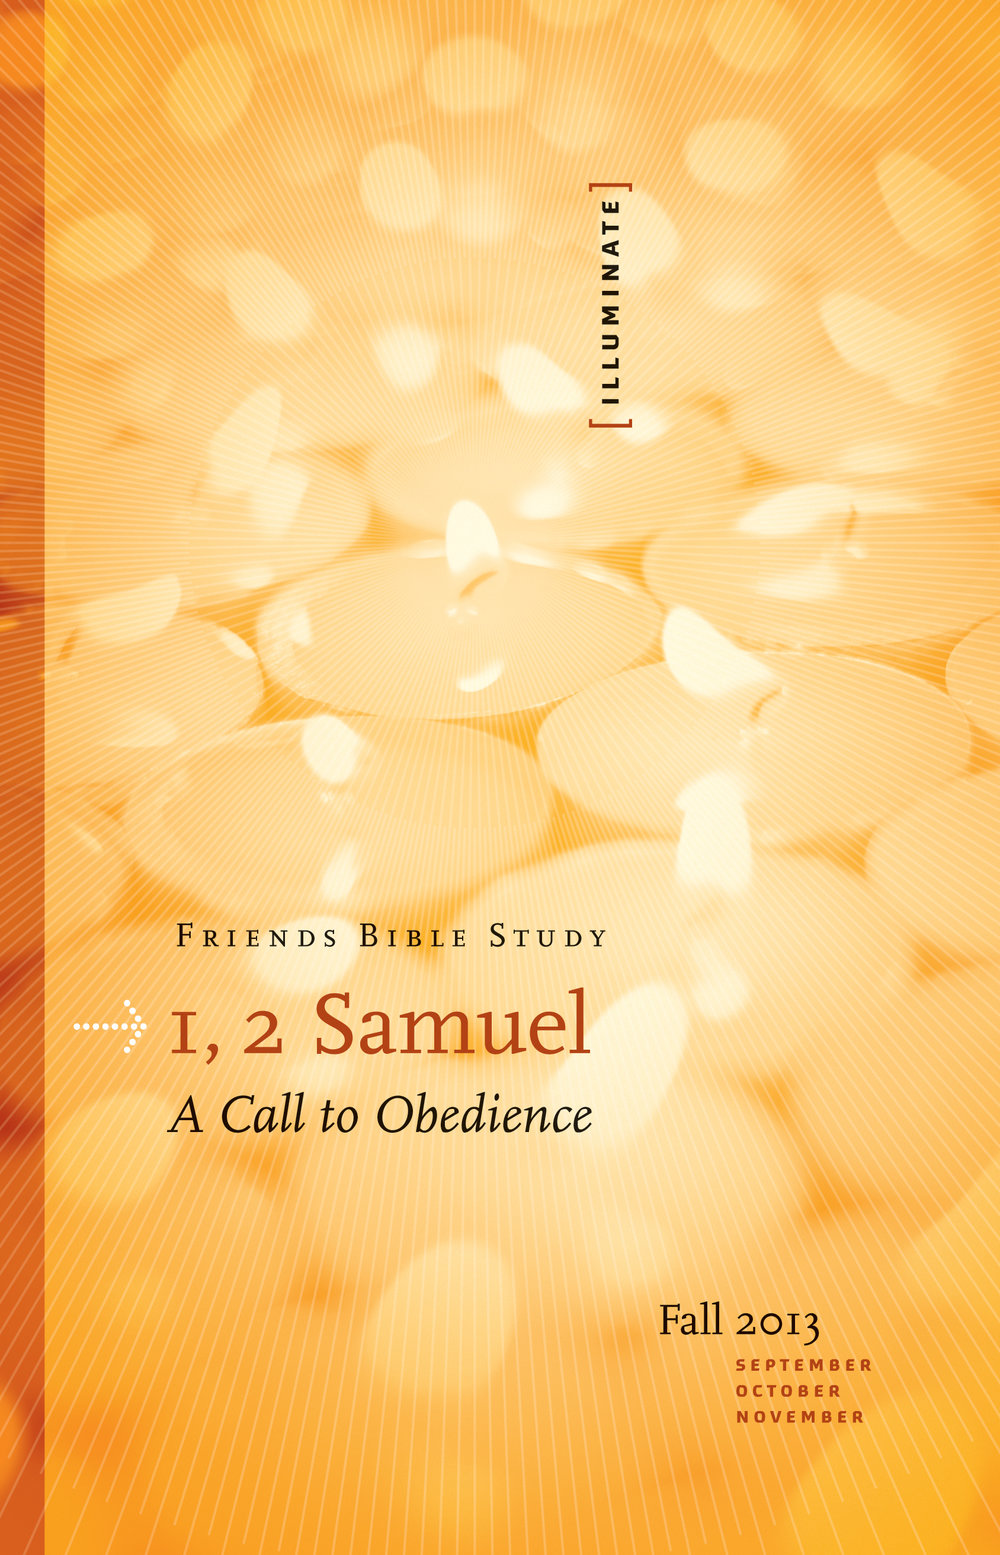 Illuminate2013-14 A-fall-1,2 Samuel.jpg